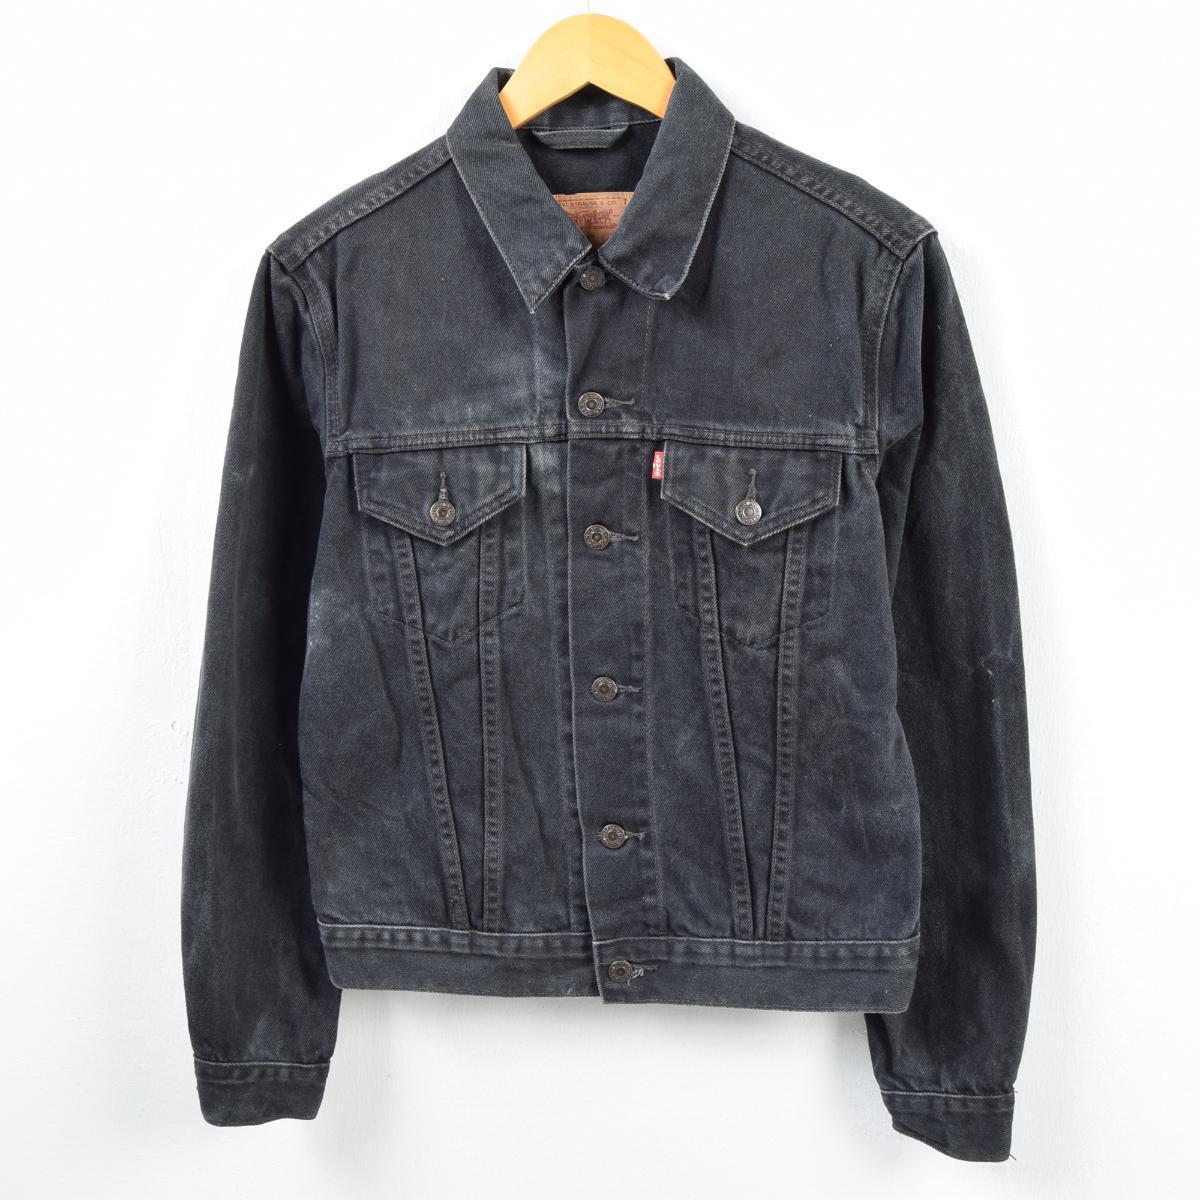 5c41aa57813e 90s Levis Levi's FOR WOMEN black denim jacket G Jean Lady's L /wba5118 ...